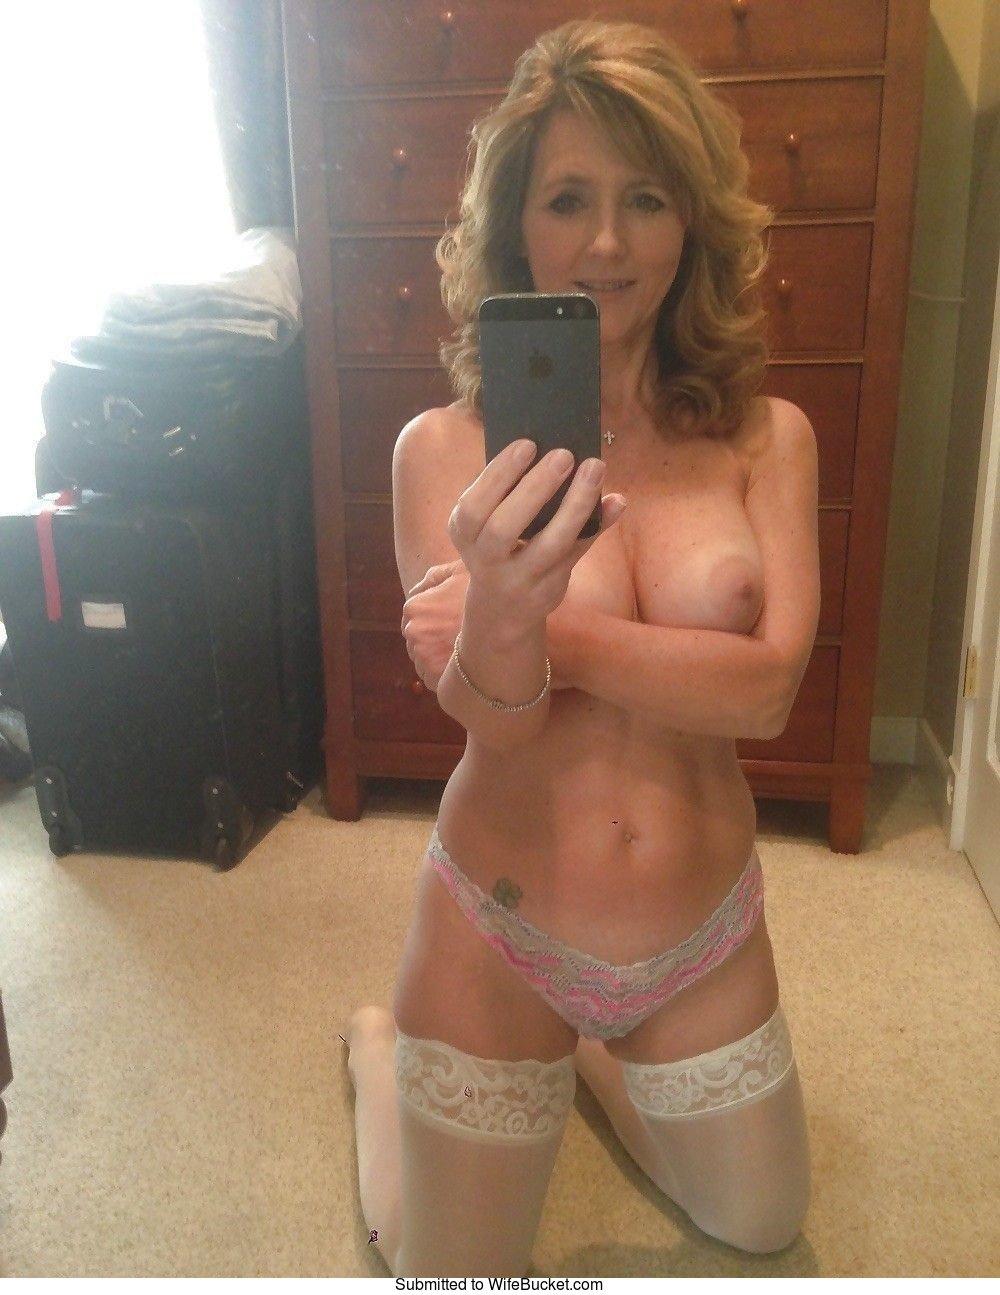 Wifebucket  Nude Selfies Of Wives Over 40-7922